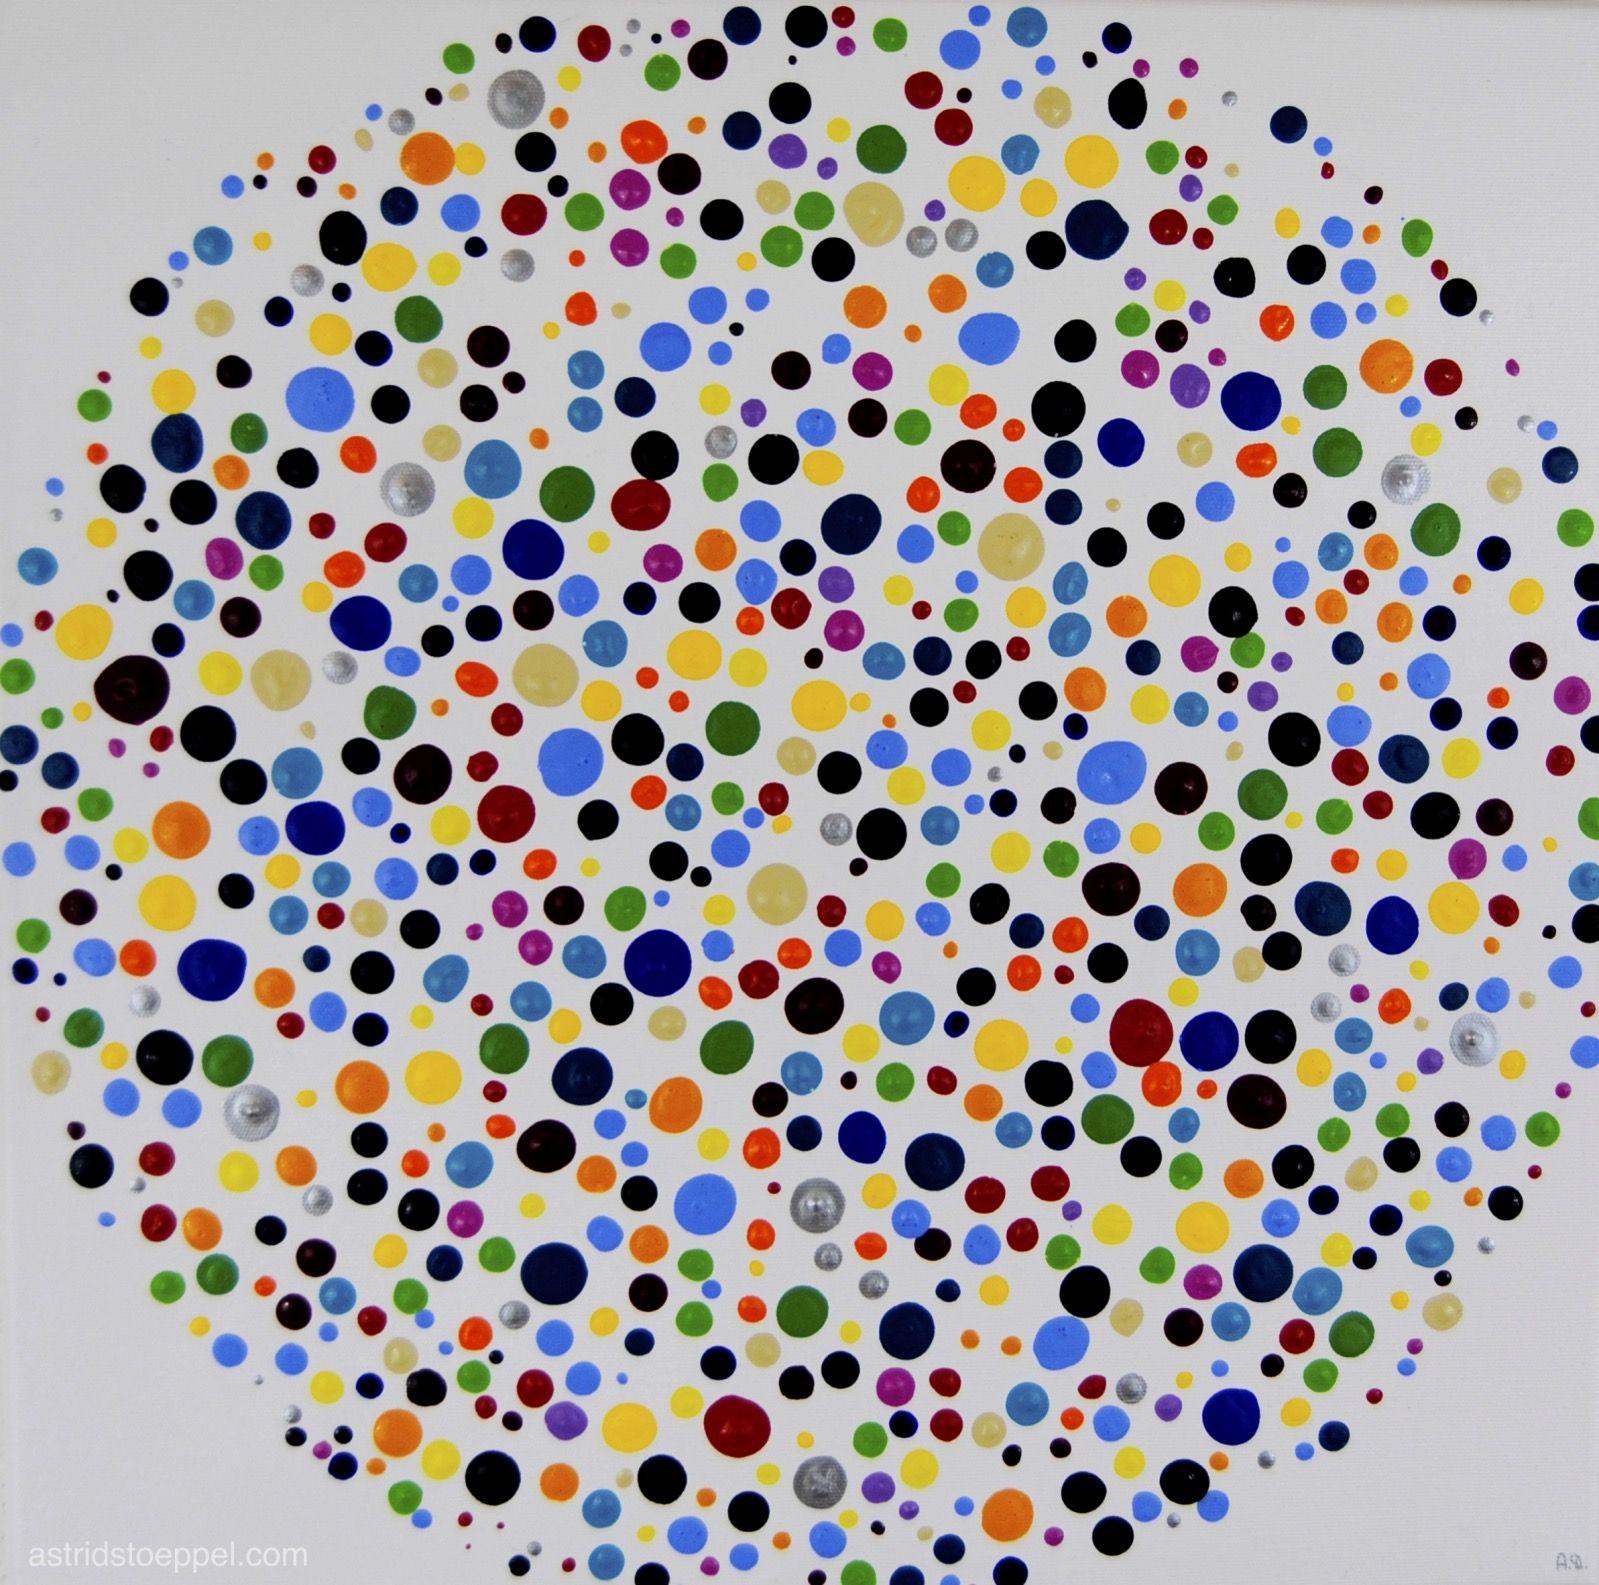 Dotted Acrylic On Canvas 50x50cm Astrid Stoeppel Astridstoeppel Com Paint Chip Art Original Art Collection Homeschool Art